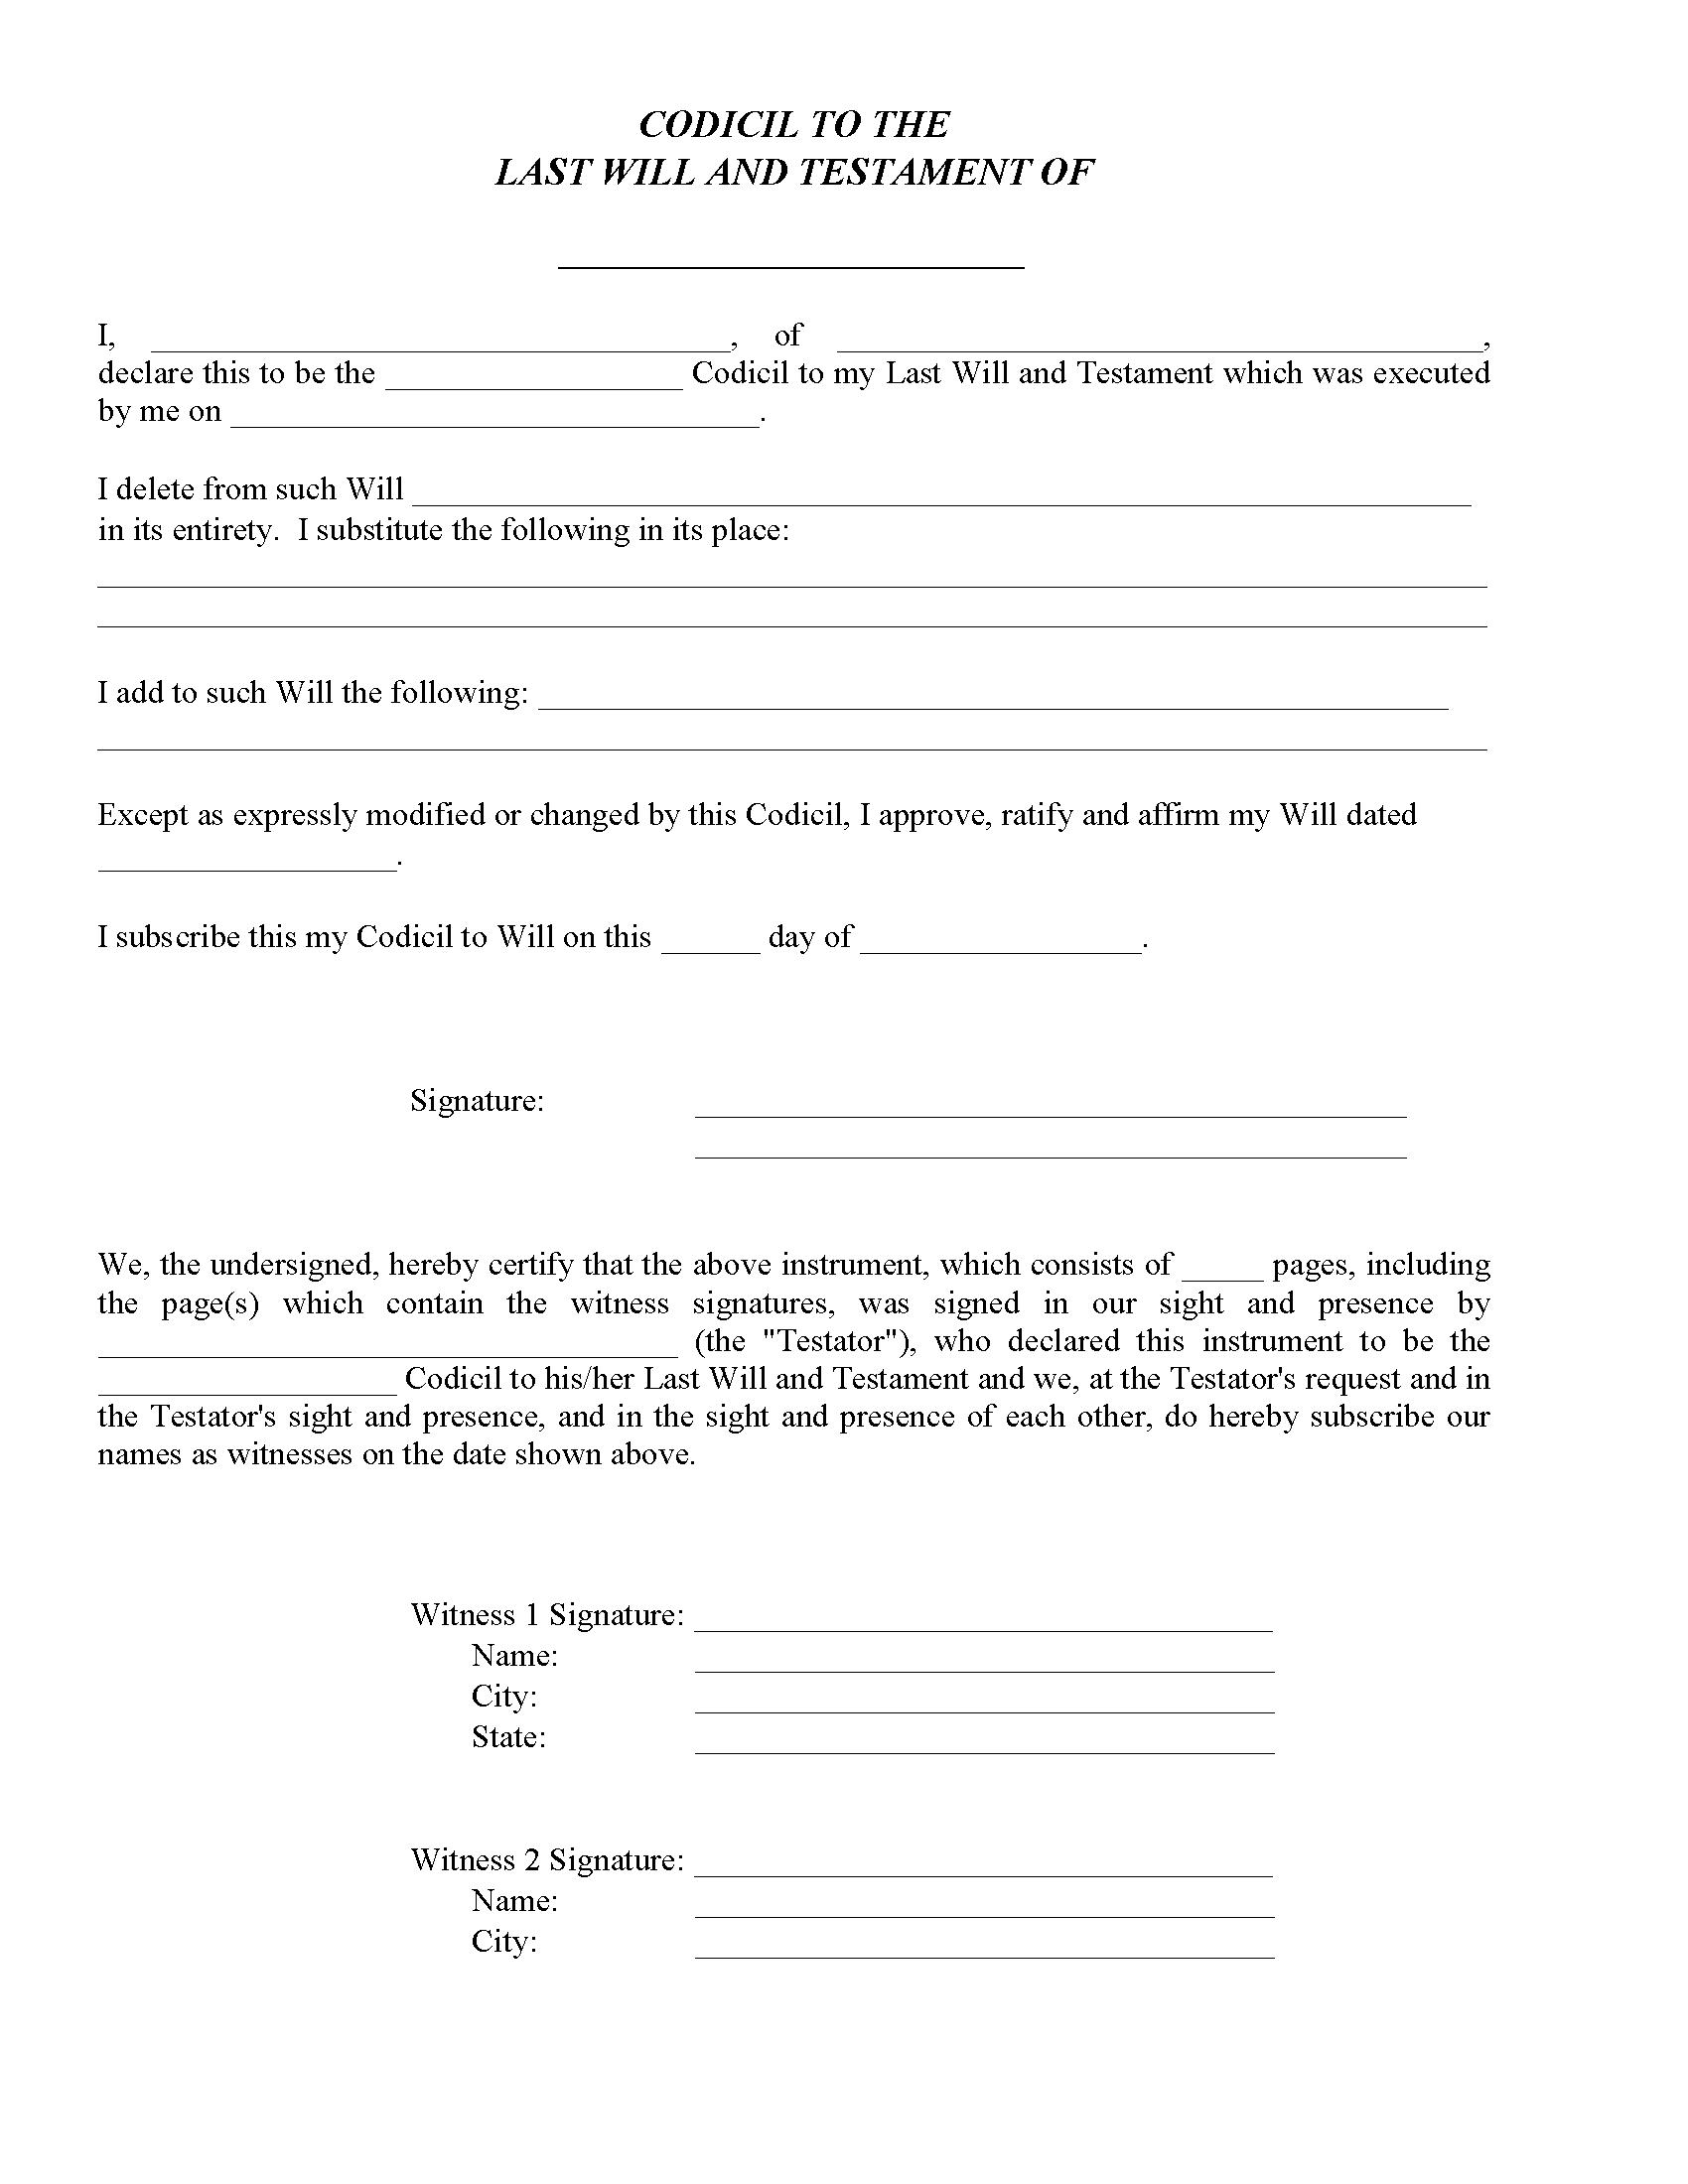 Massachusetts Codicil To Will Form